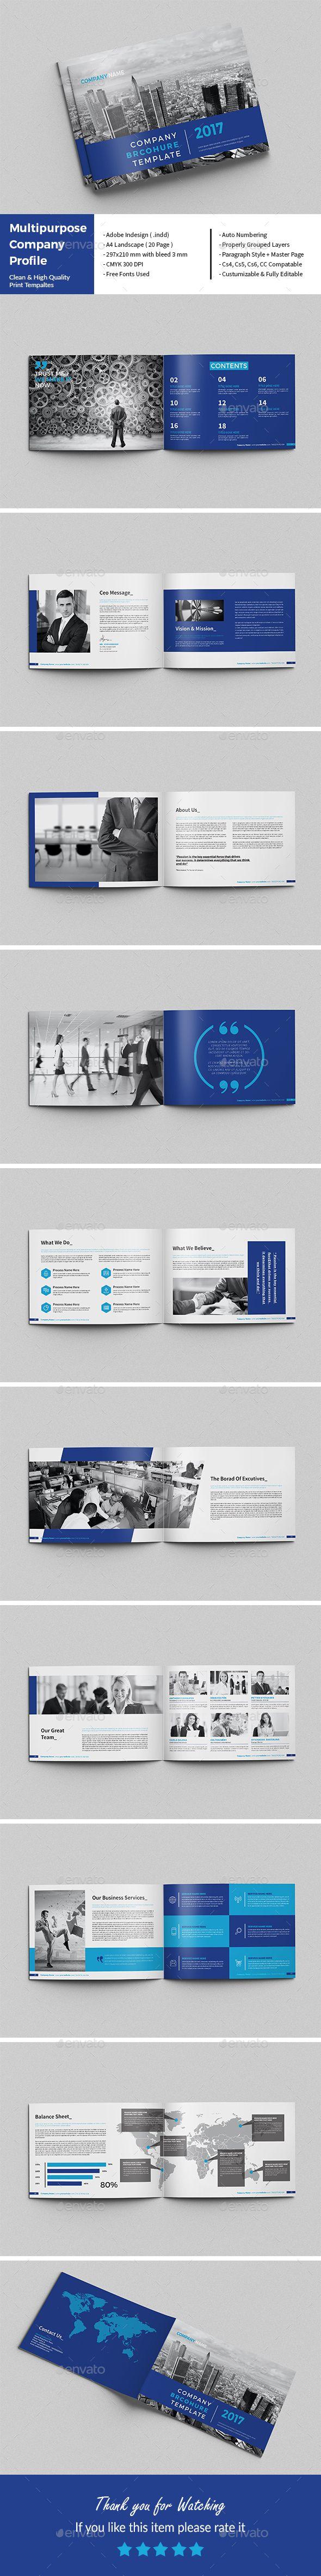 25 best ideas about Company Profile – Company Profile